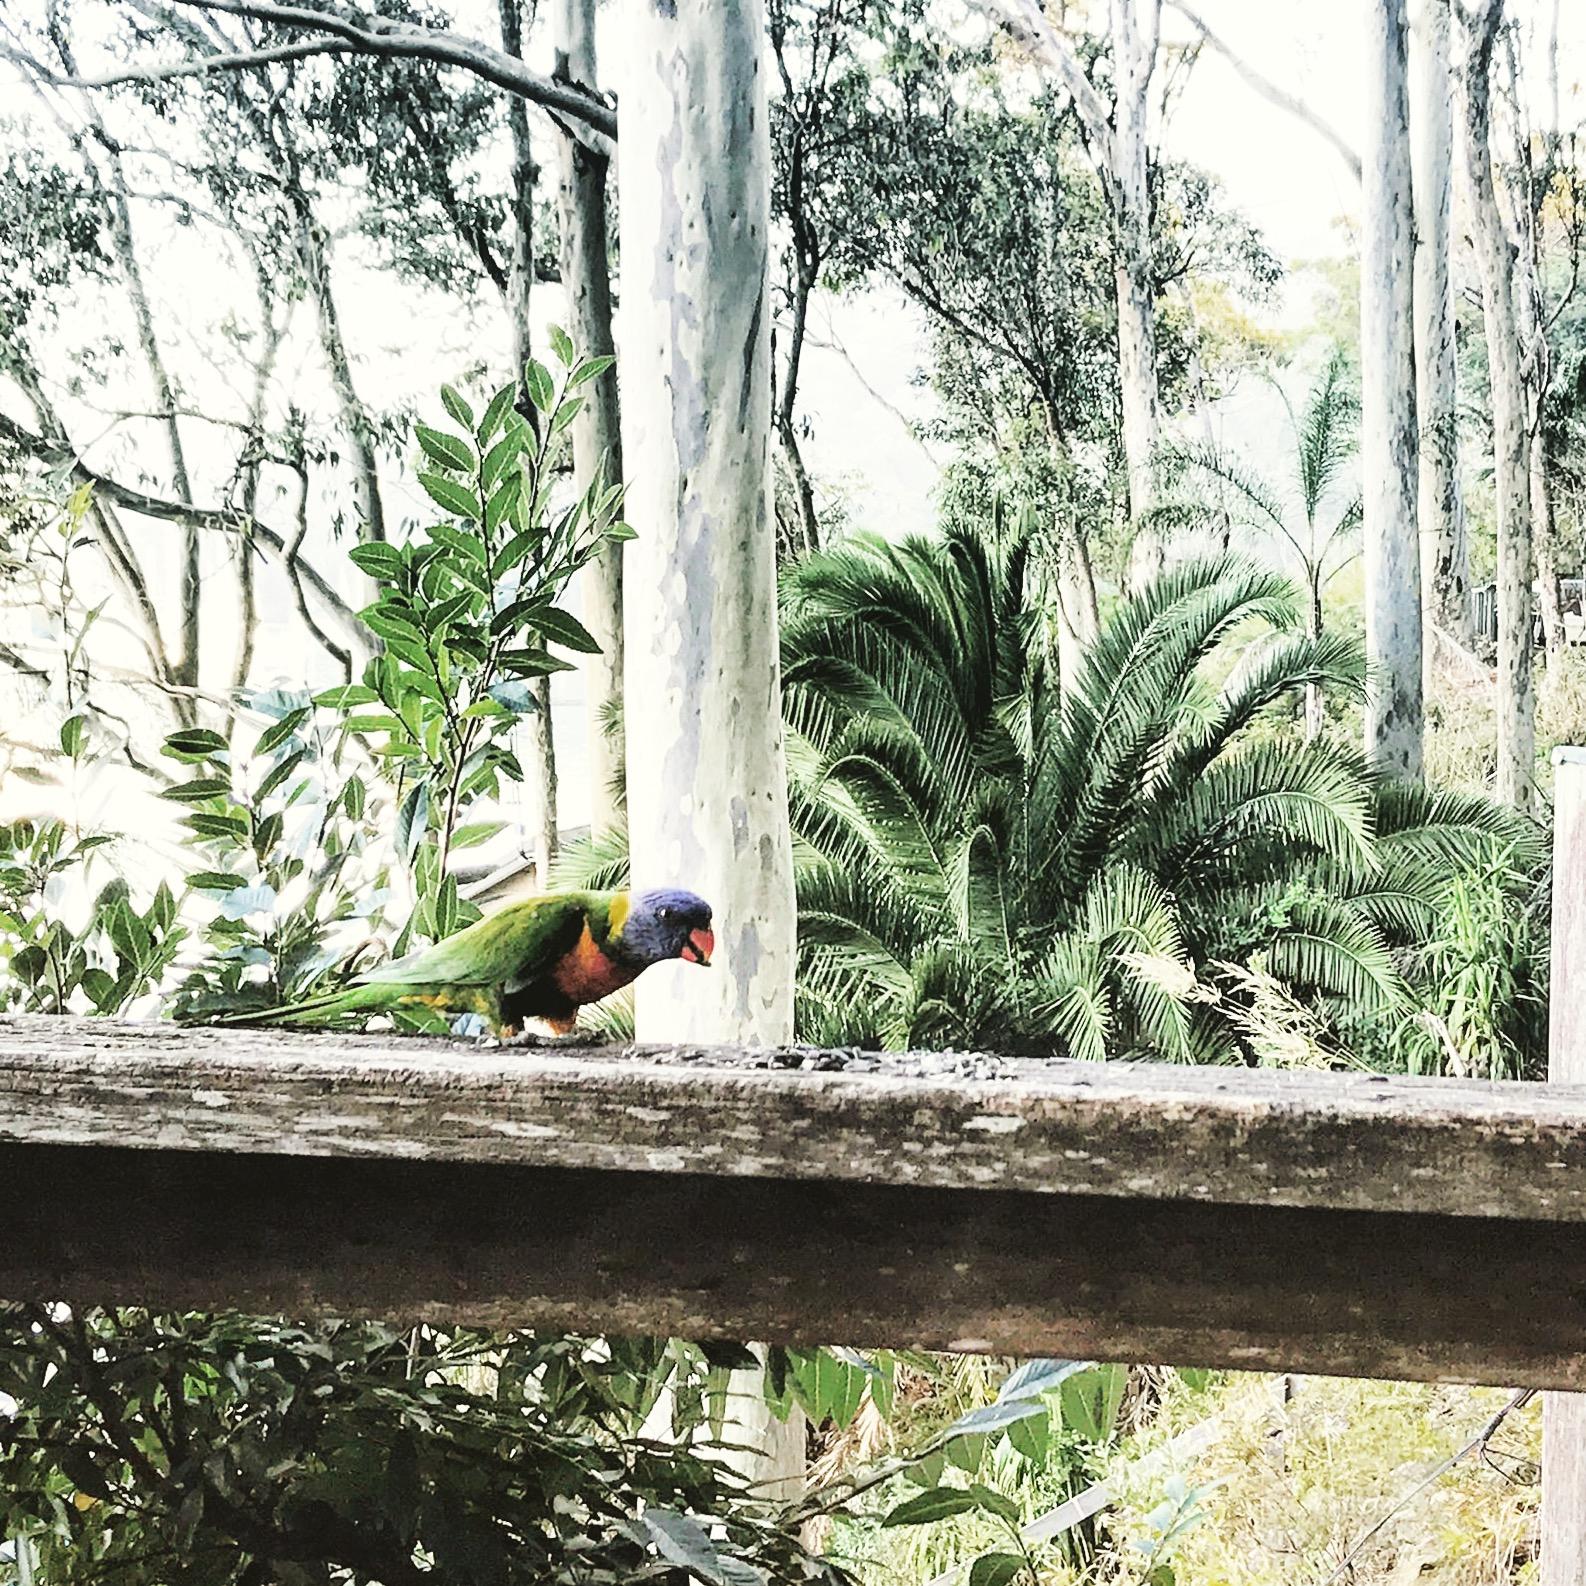 Birdfeeding on the caretakers balcony.jpg